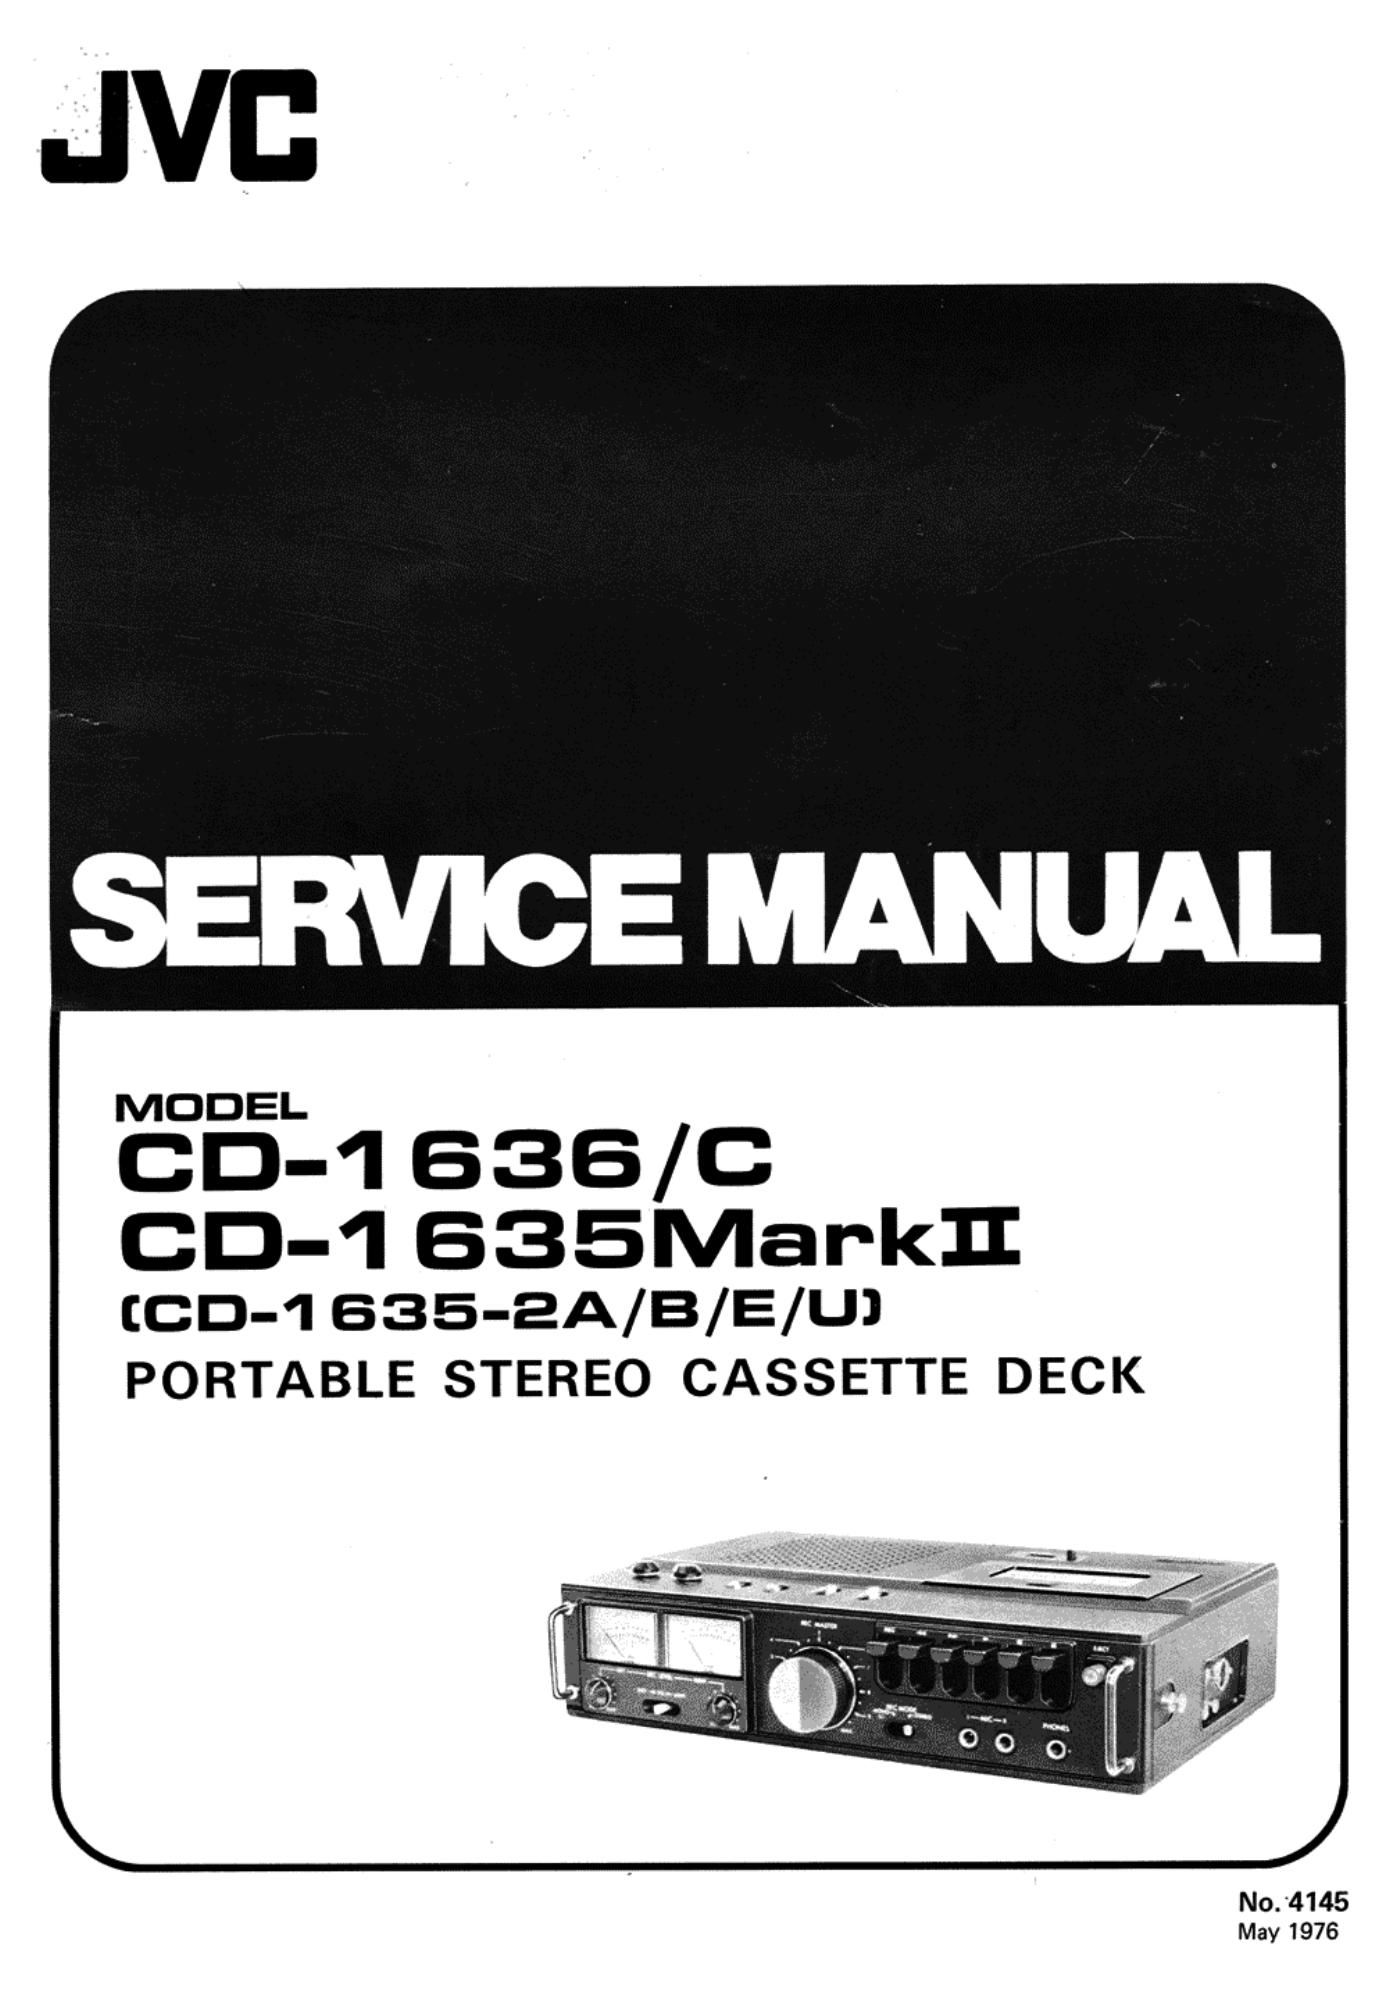 Free download Jvc KWNT 1 Service Manual